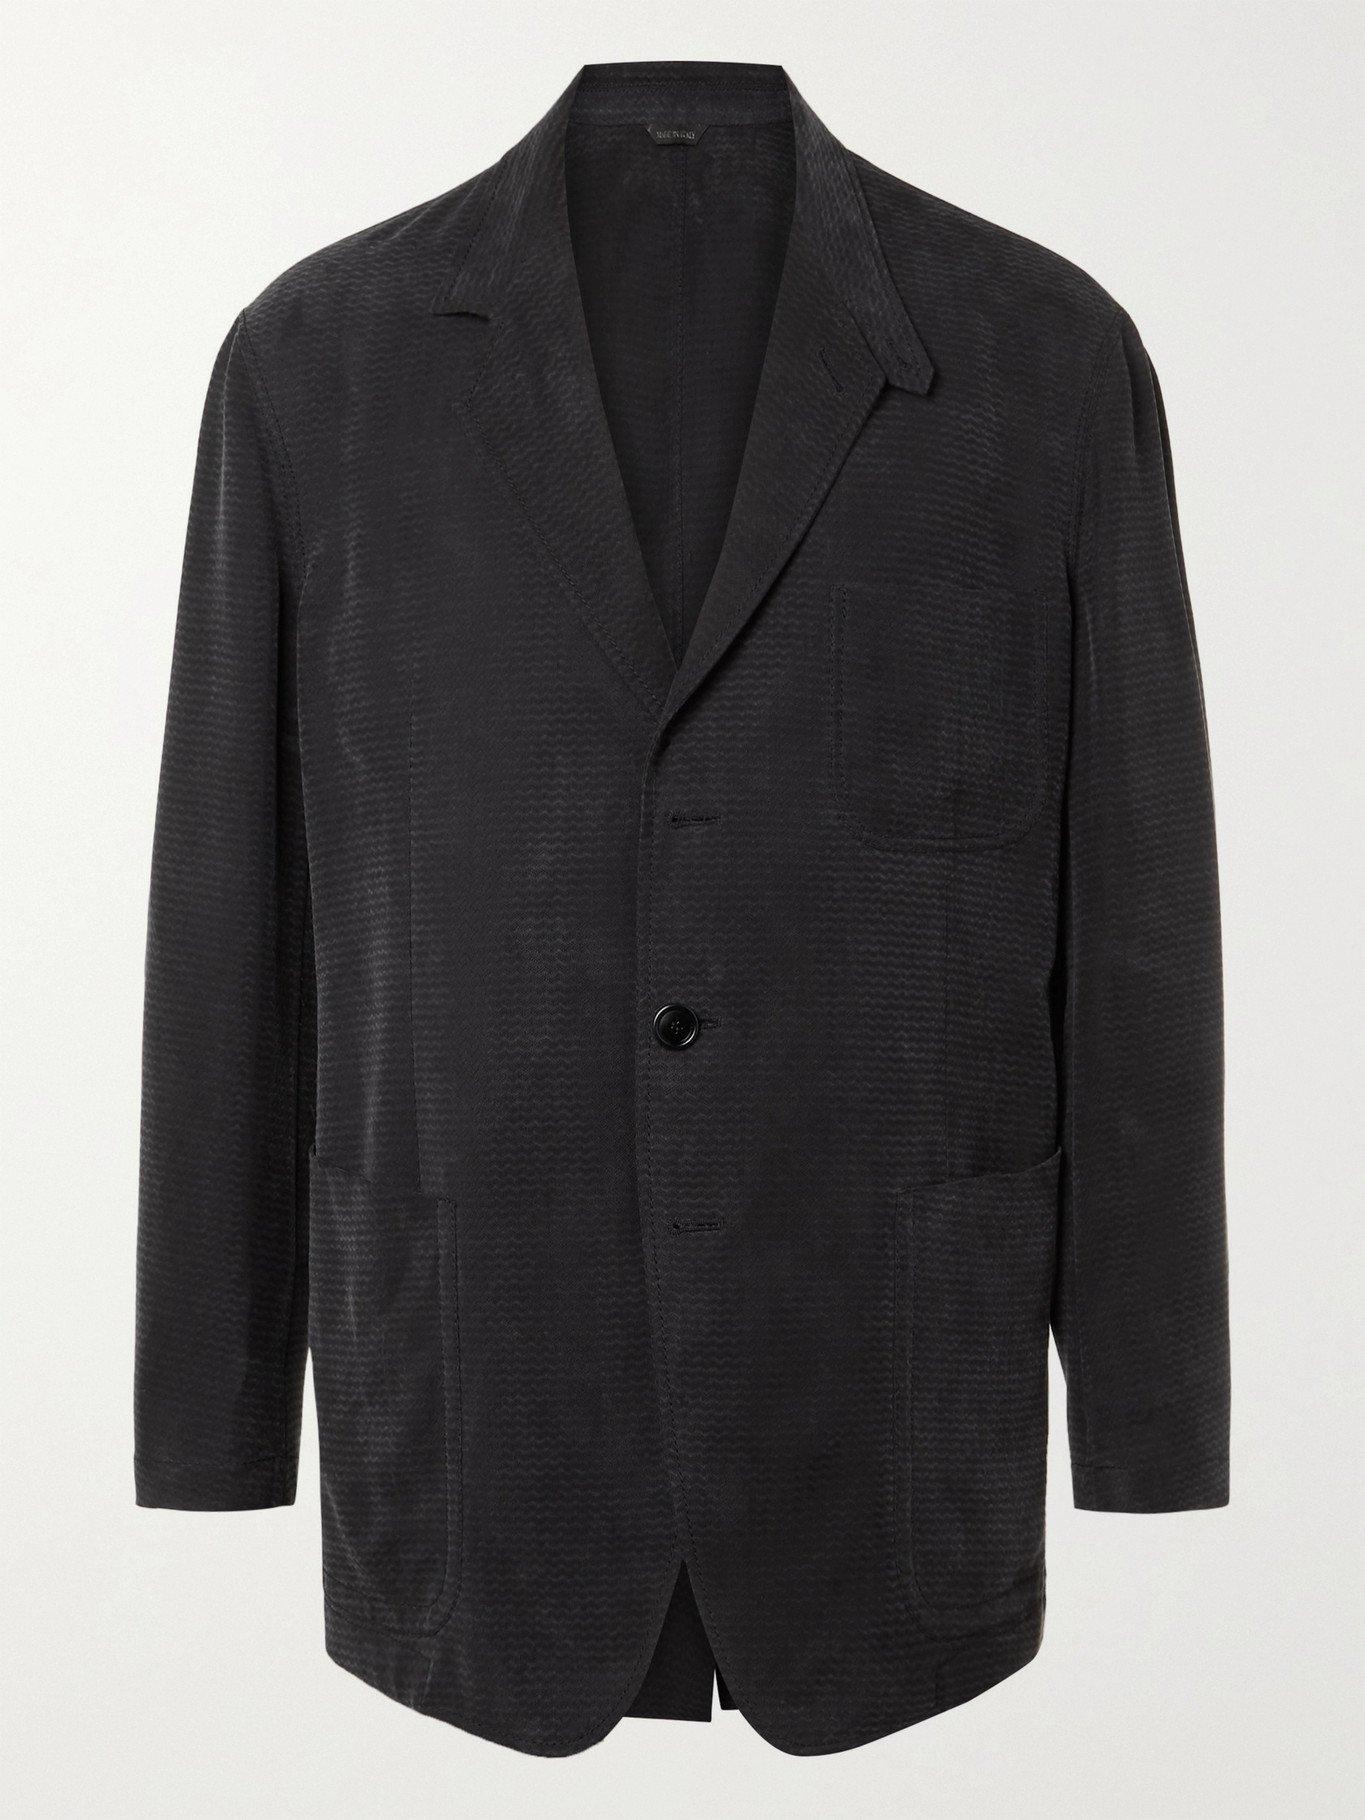 GIORGIO ARMANI - Unstructured Herringbone-Jacquard Suit Jacket - Blue - IT 46